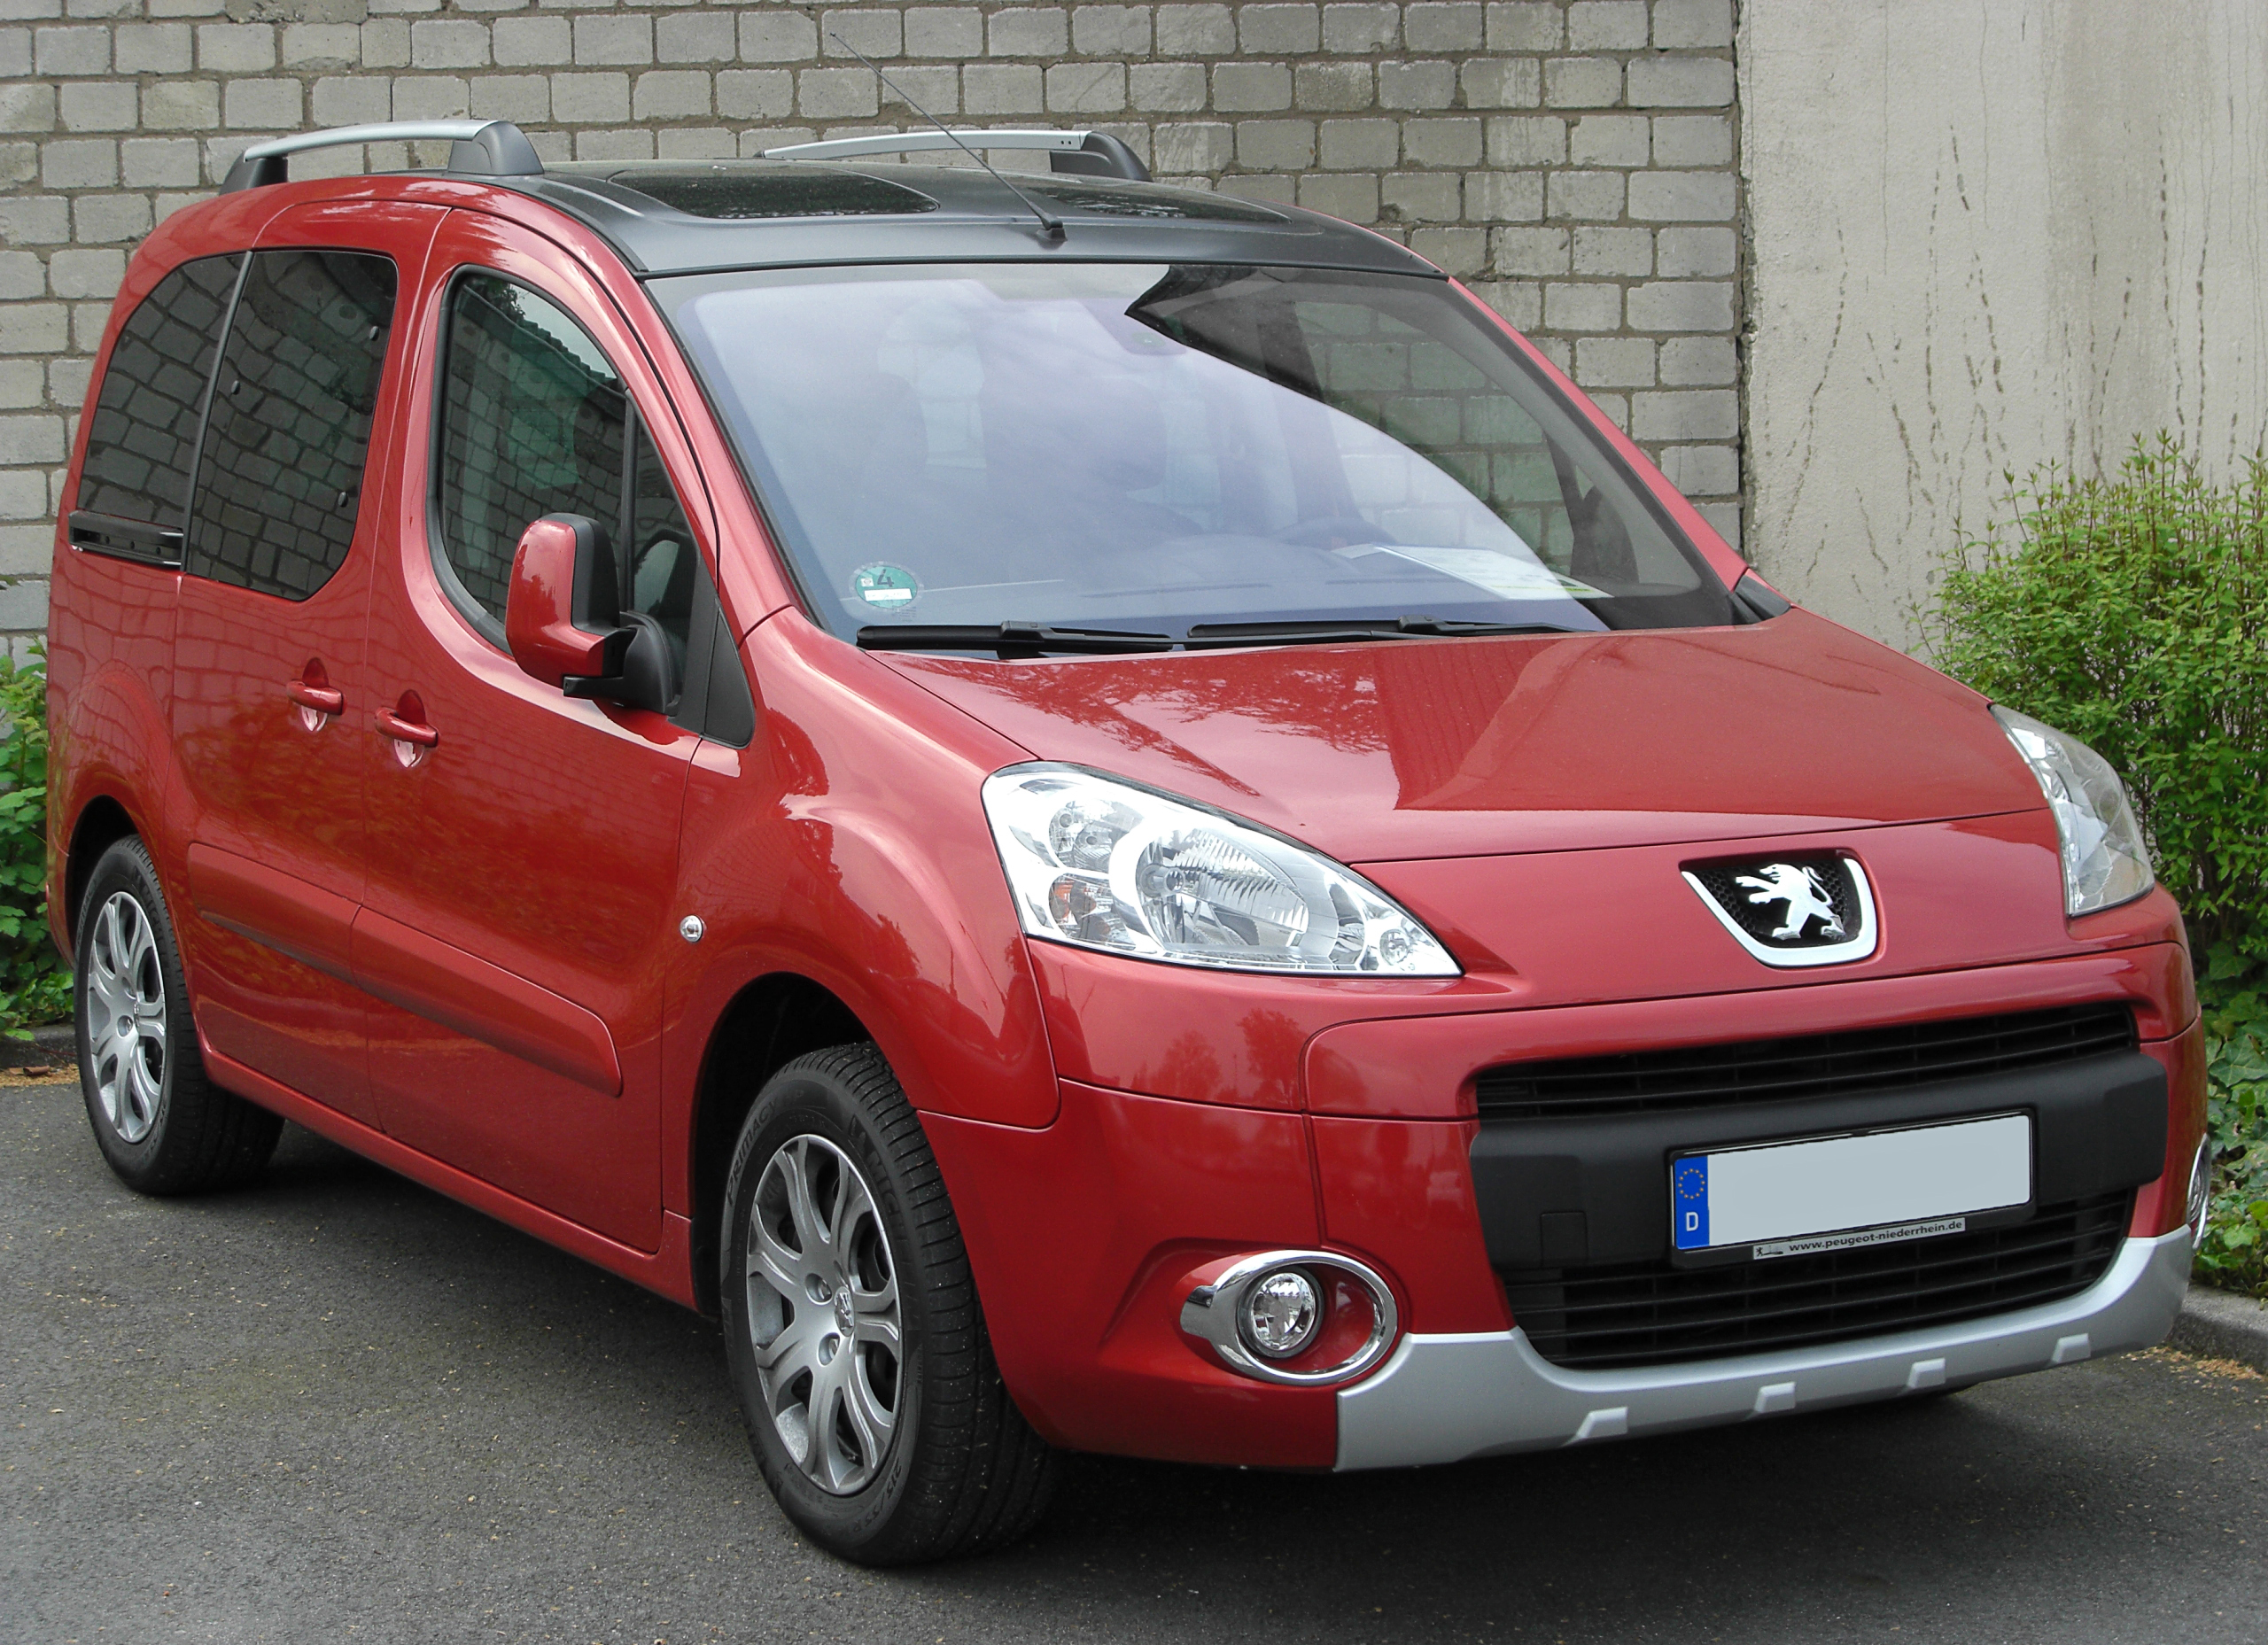 File:Peugeot Partner Tepee front 20100515.jpg - Wikimedia ...